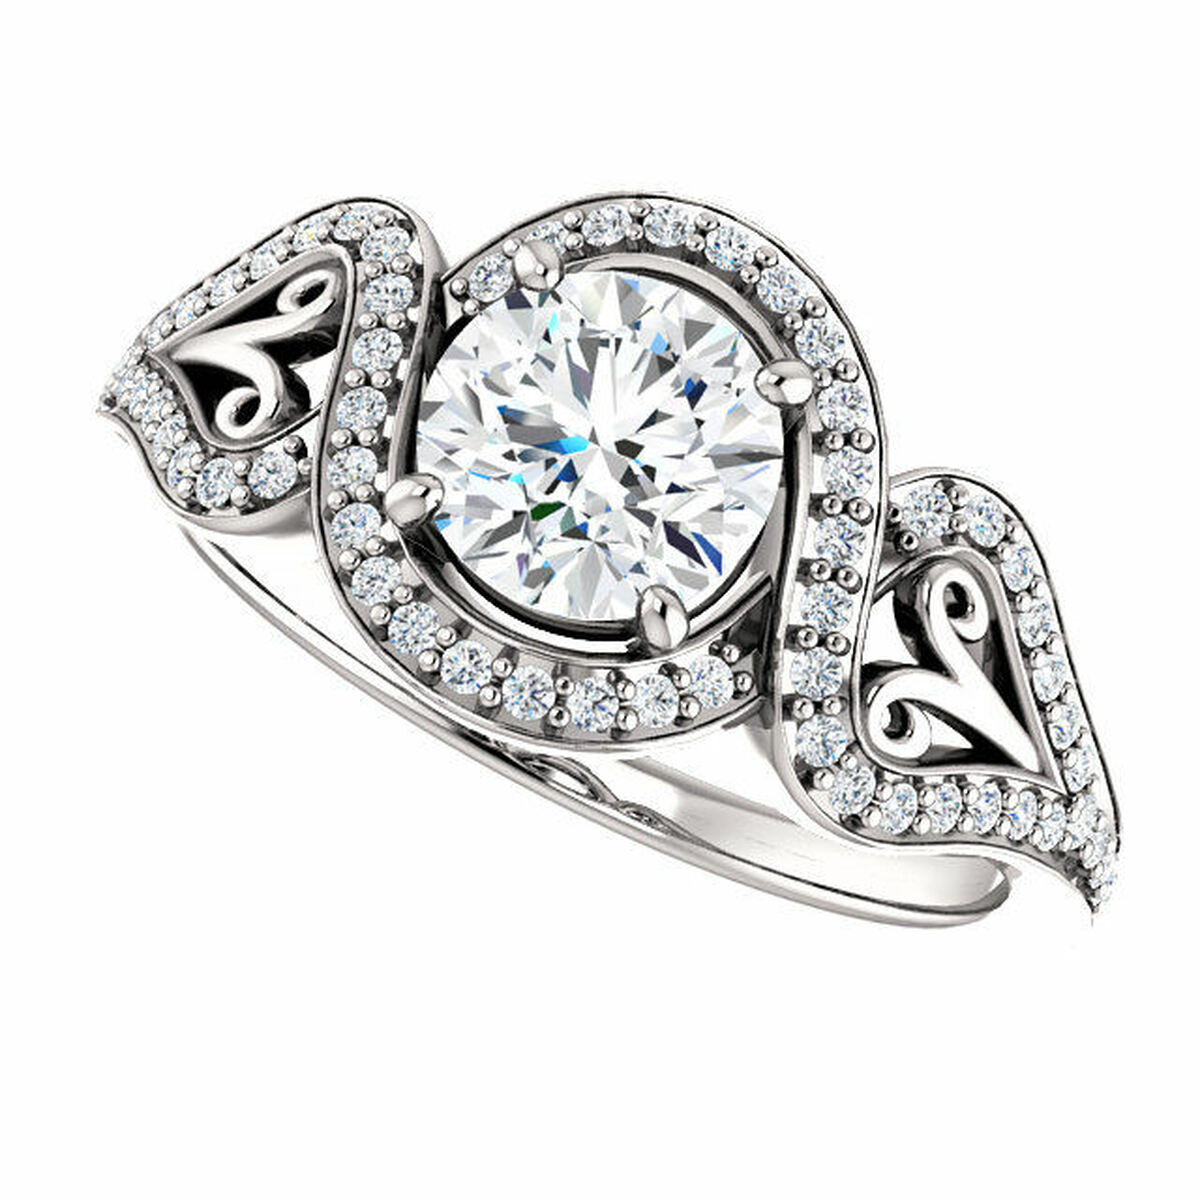 White Gold Round Engagement Ring